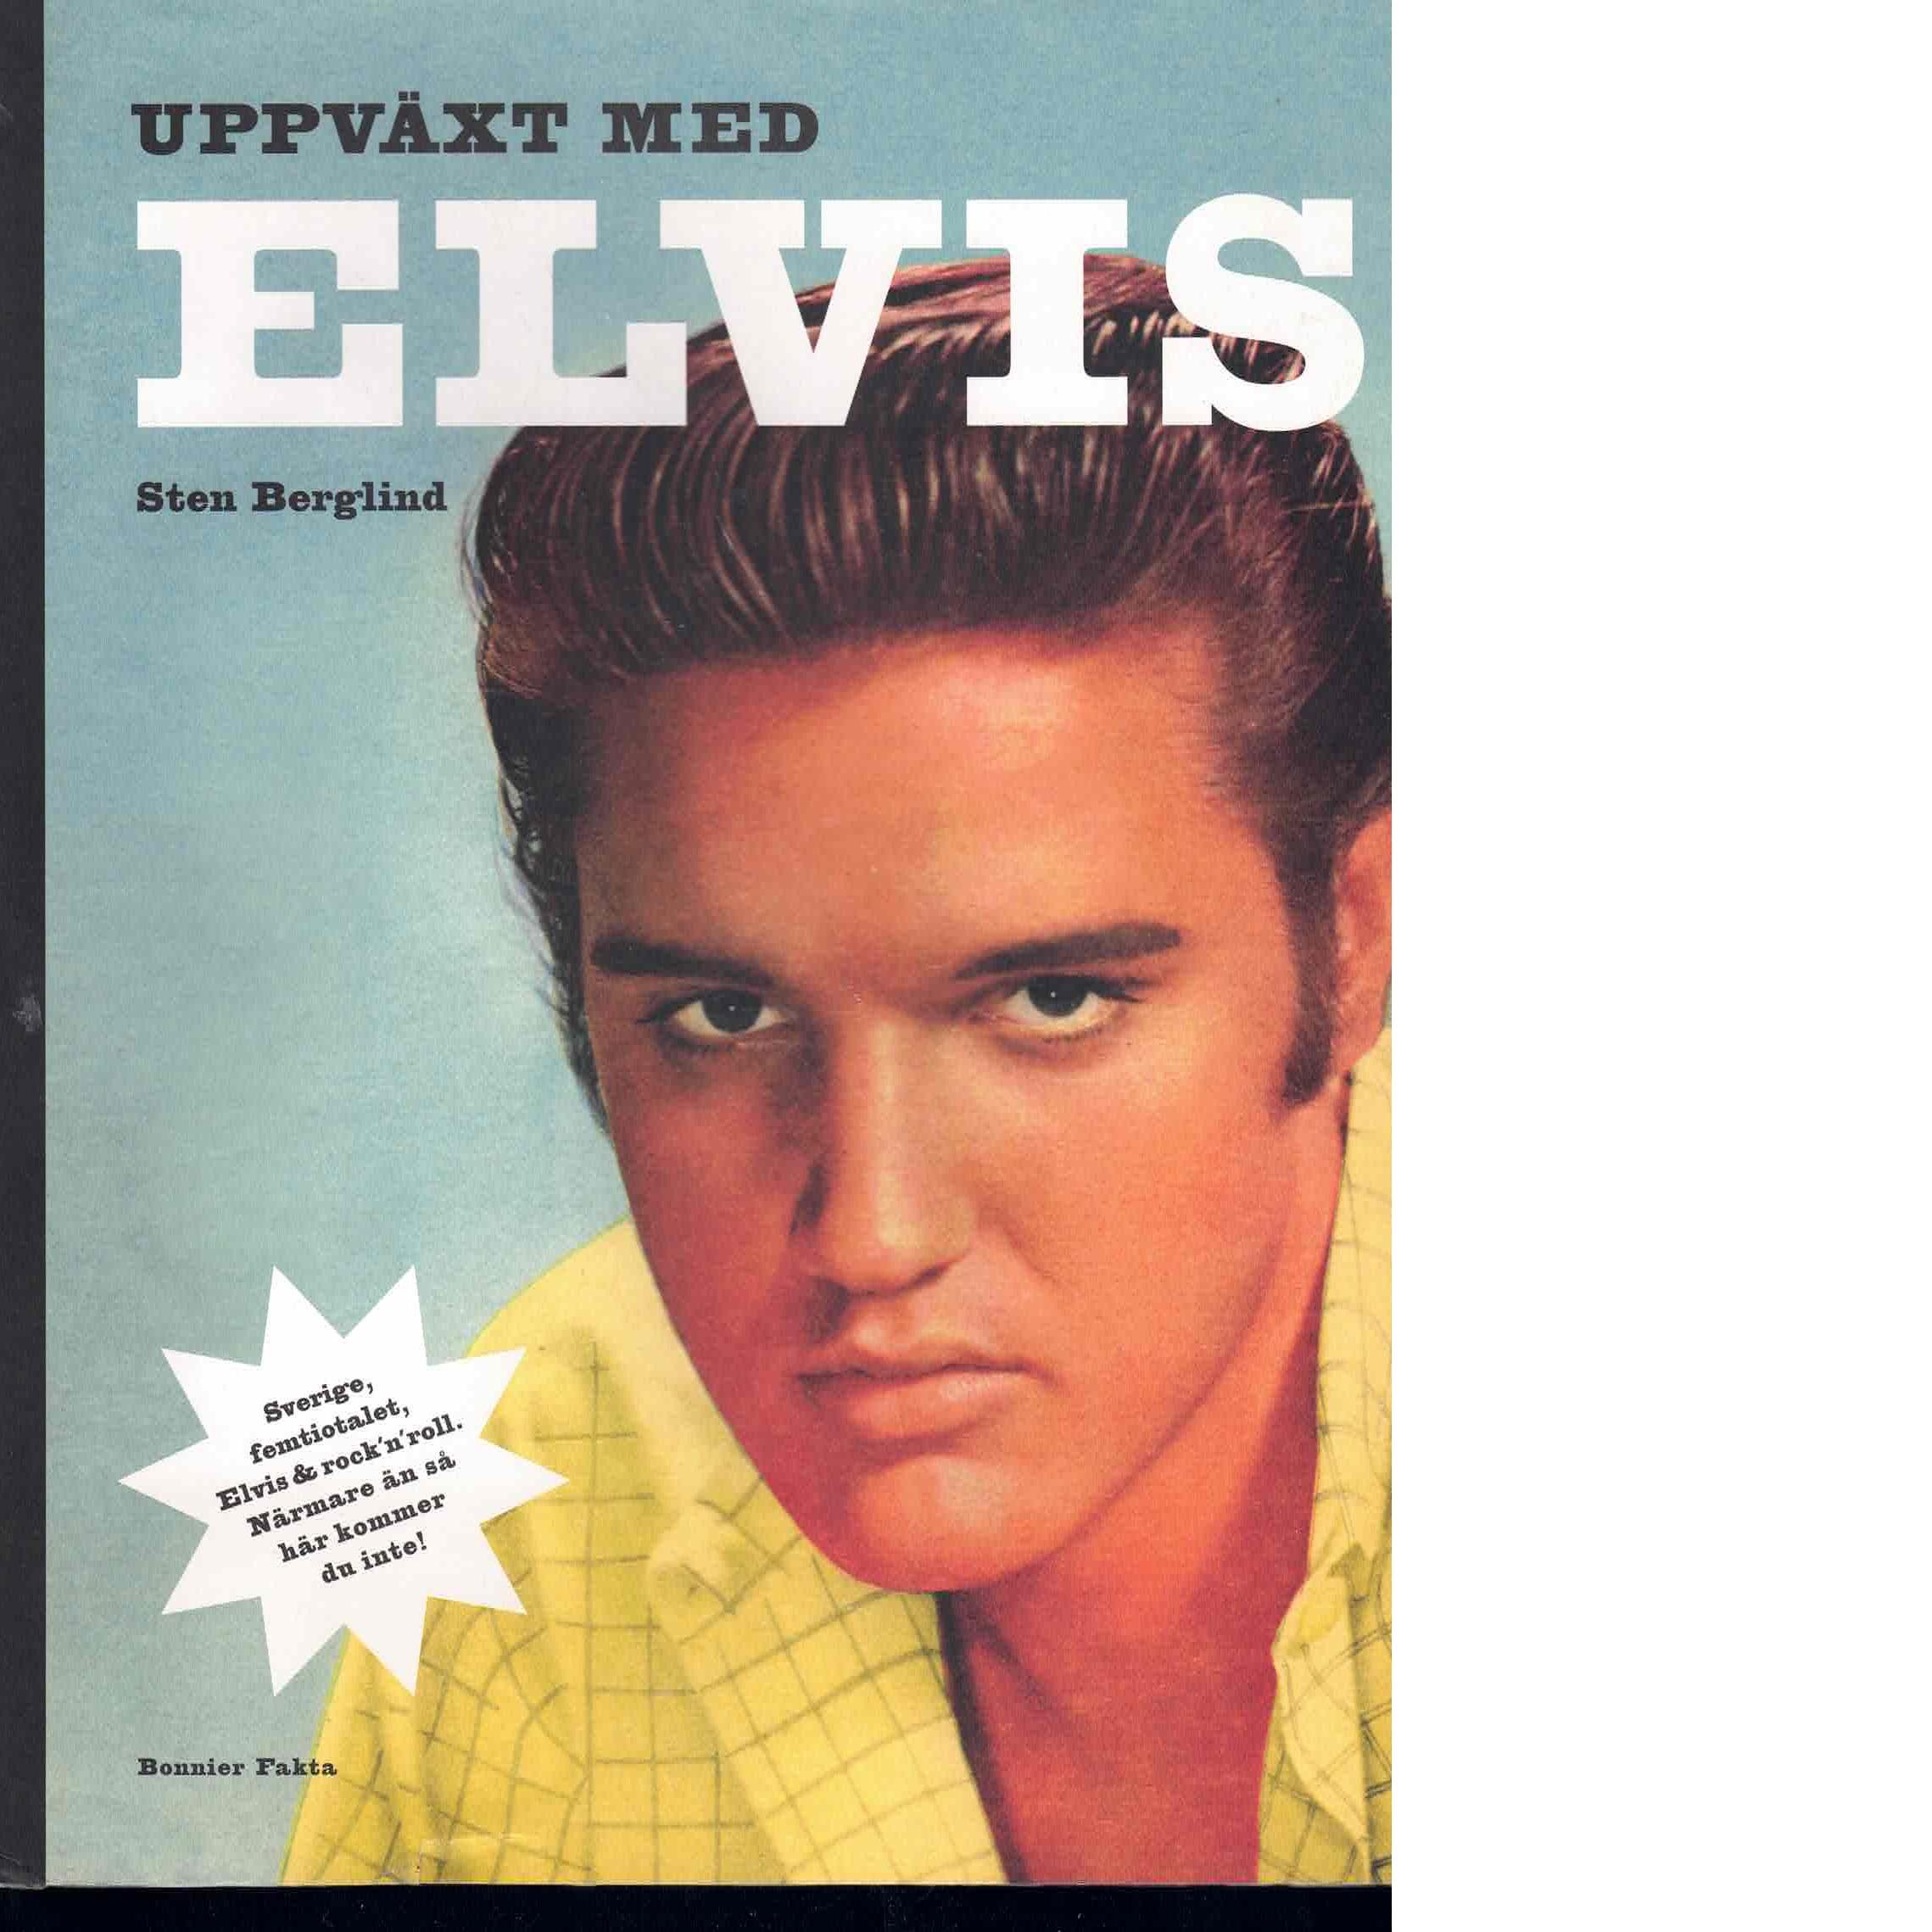 Uppväxt med Elvis Sverige, femtiotalet - Berglind, Sten